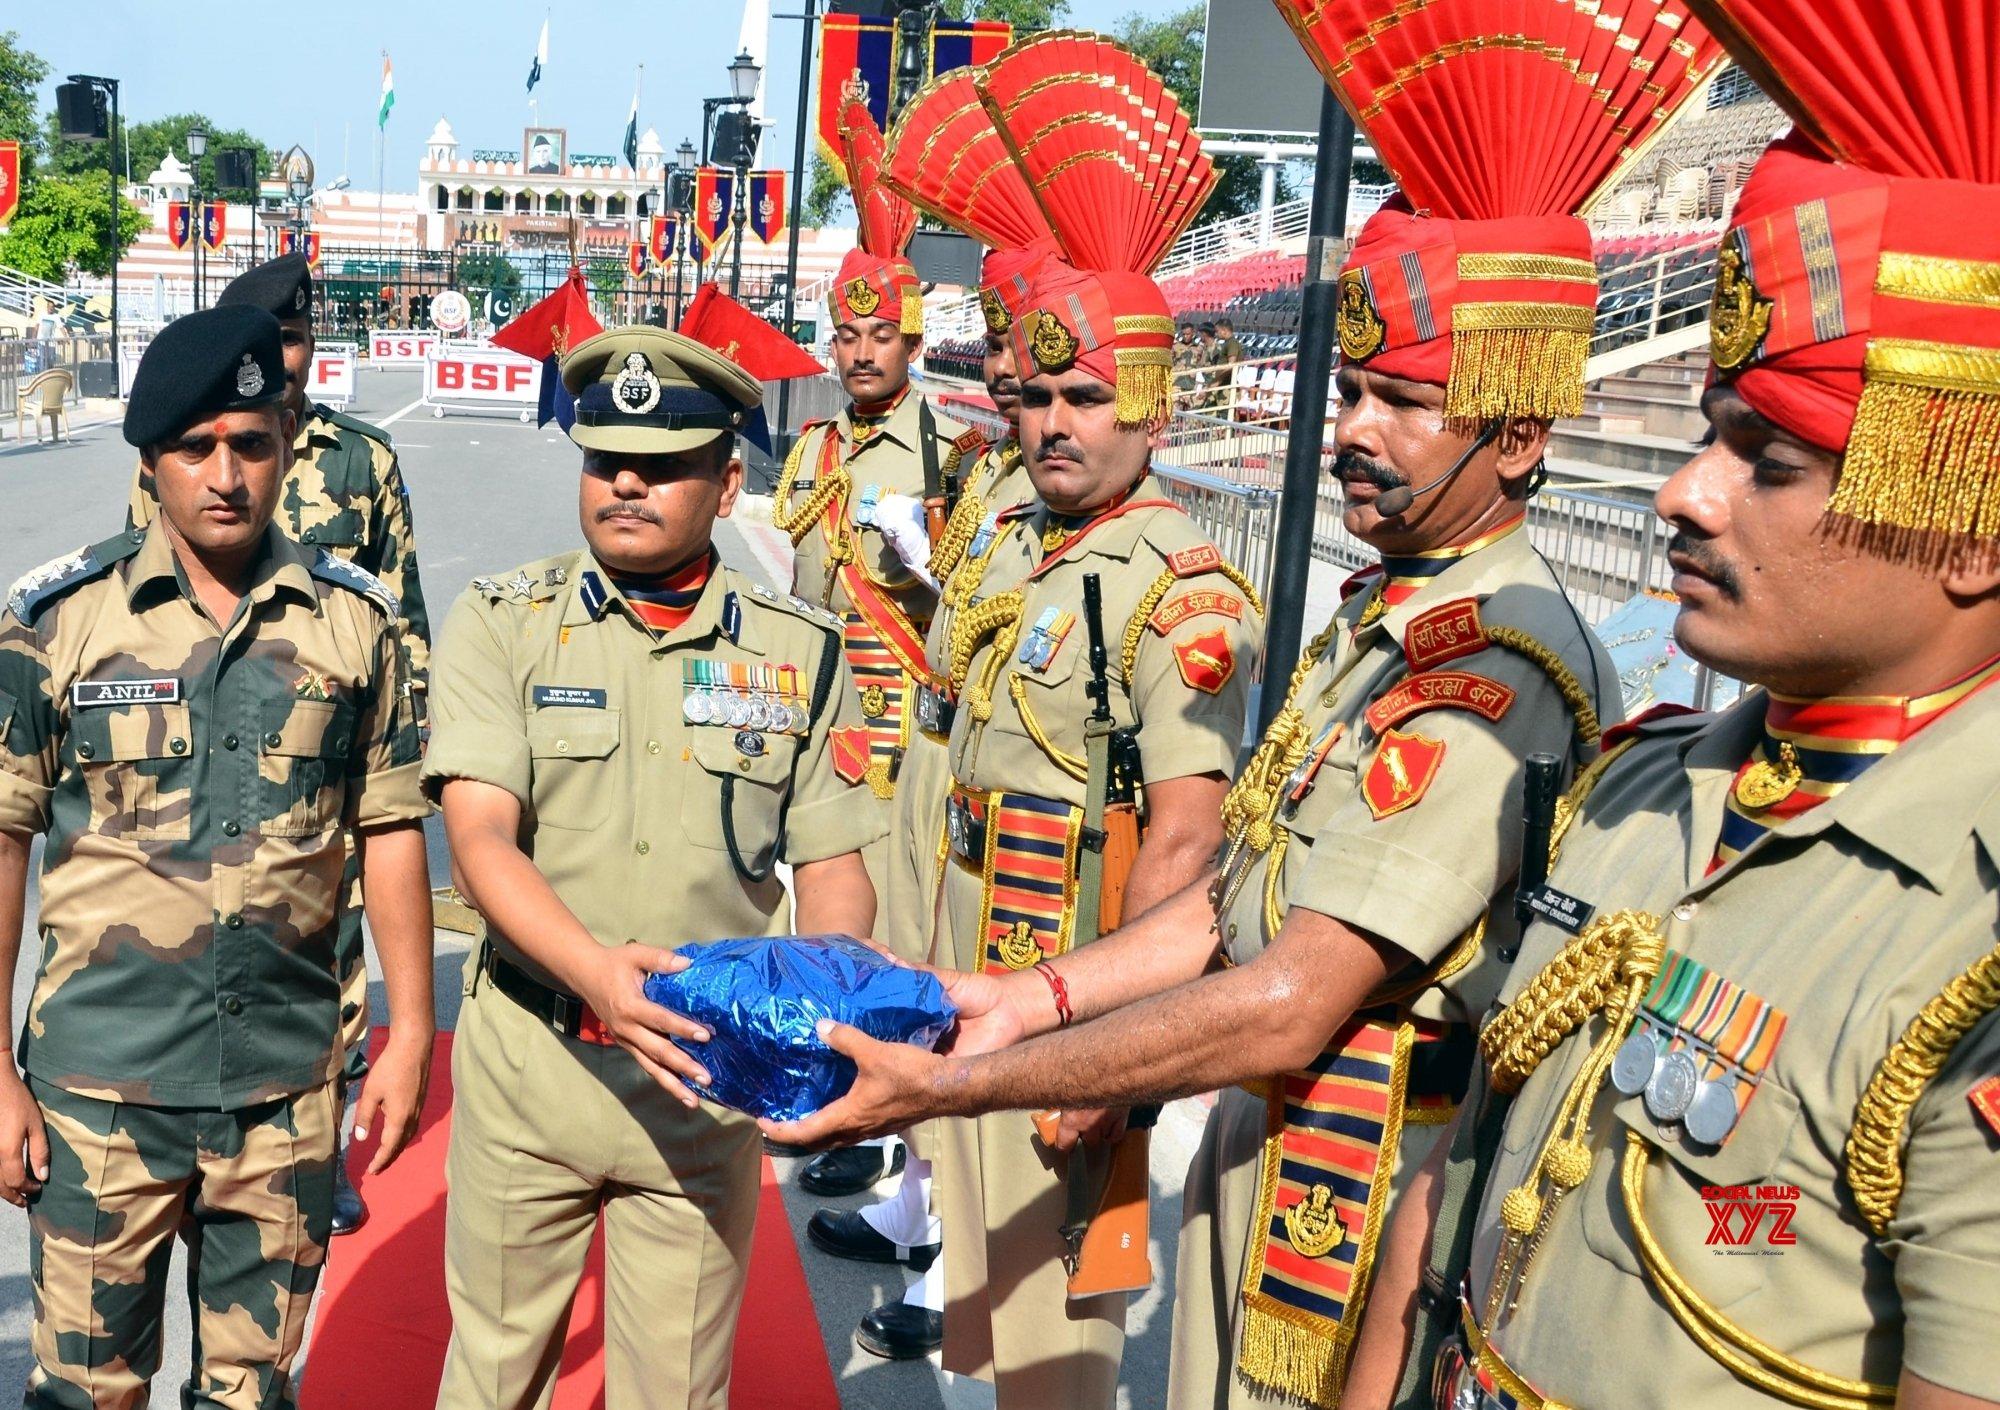 Attari (Punjab): BSF celebrates 73rd Independence Day at Attari - Wagah border #Gallery